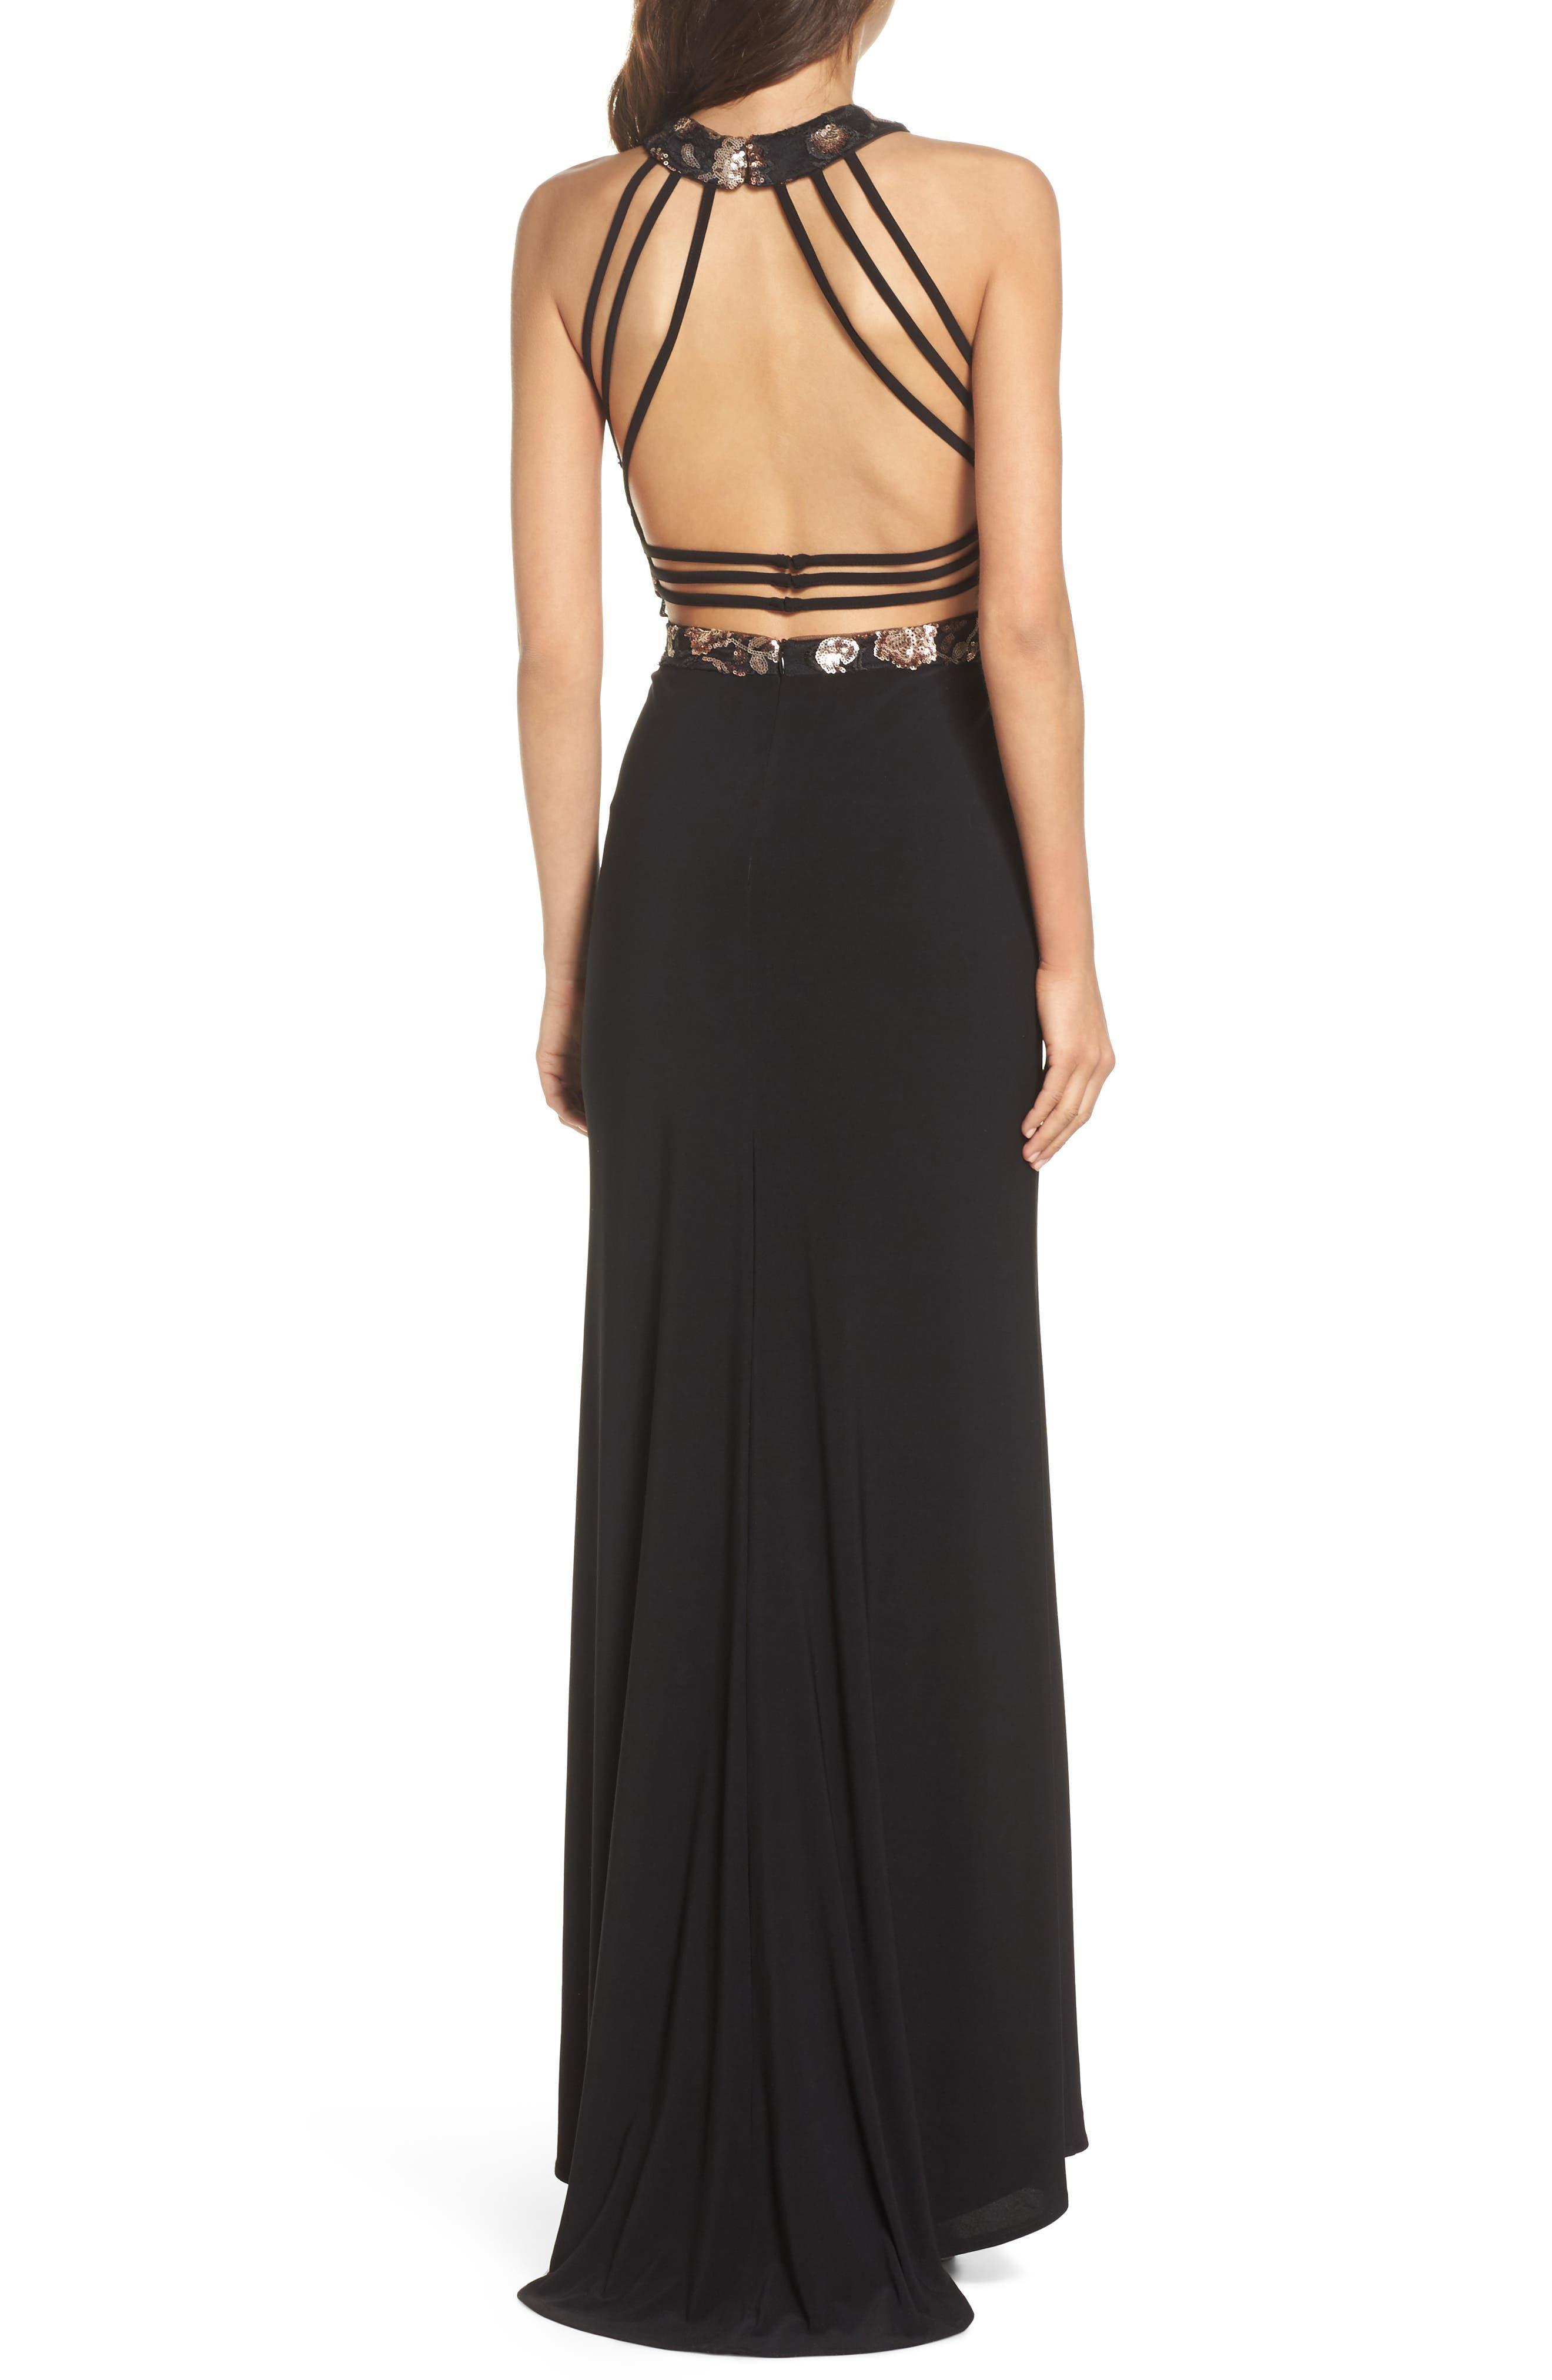 Sequin Mesh Panel Gown,                             Alternate thumbnail 2, color,                             Black / Rose Gold